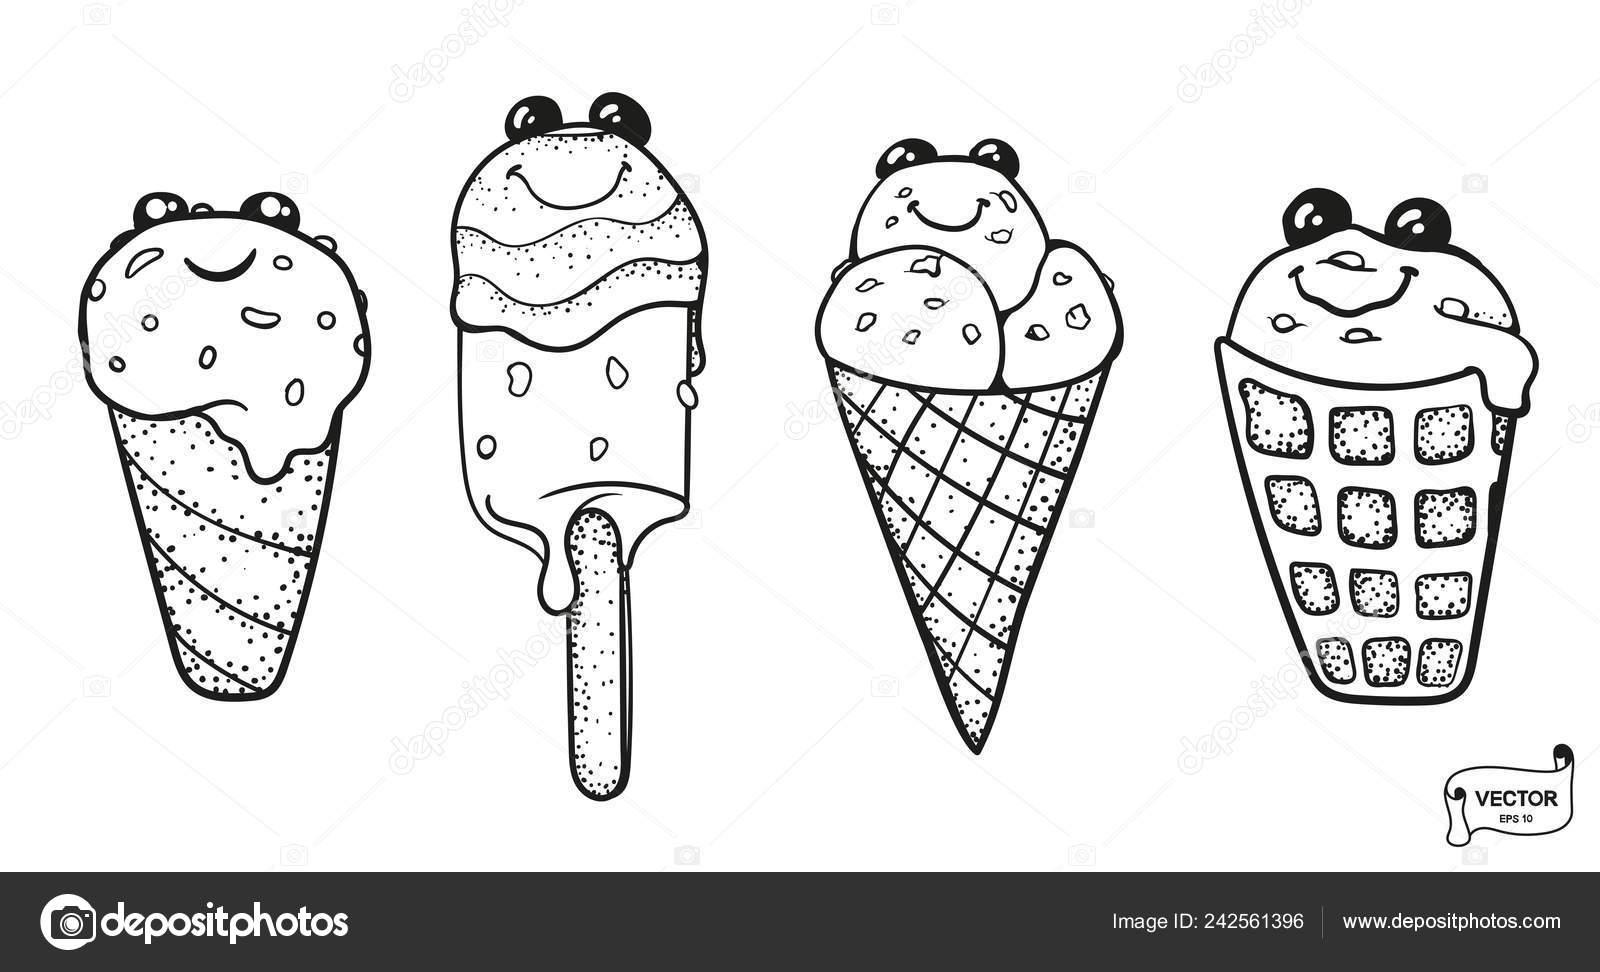 Vector Image Set Cute Cartoon Characters Smiling Kawaii Ice Cream